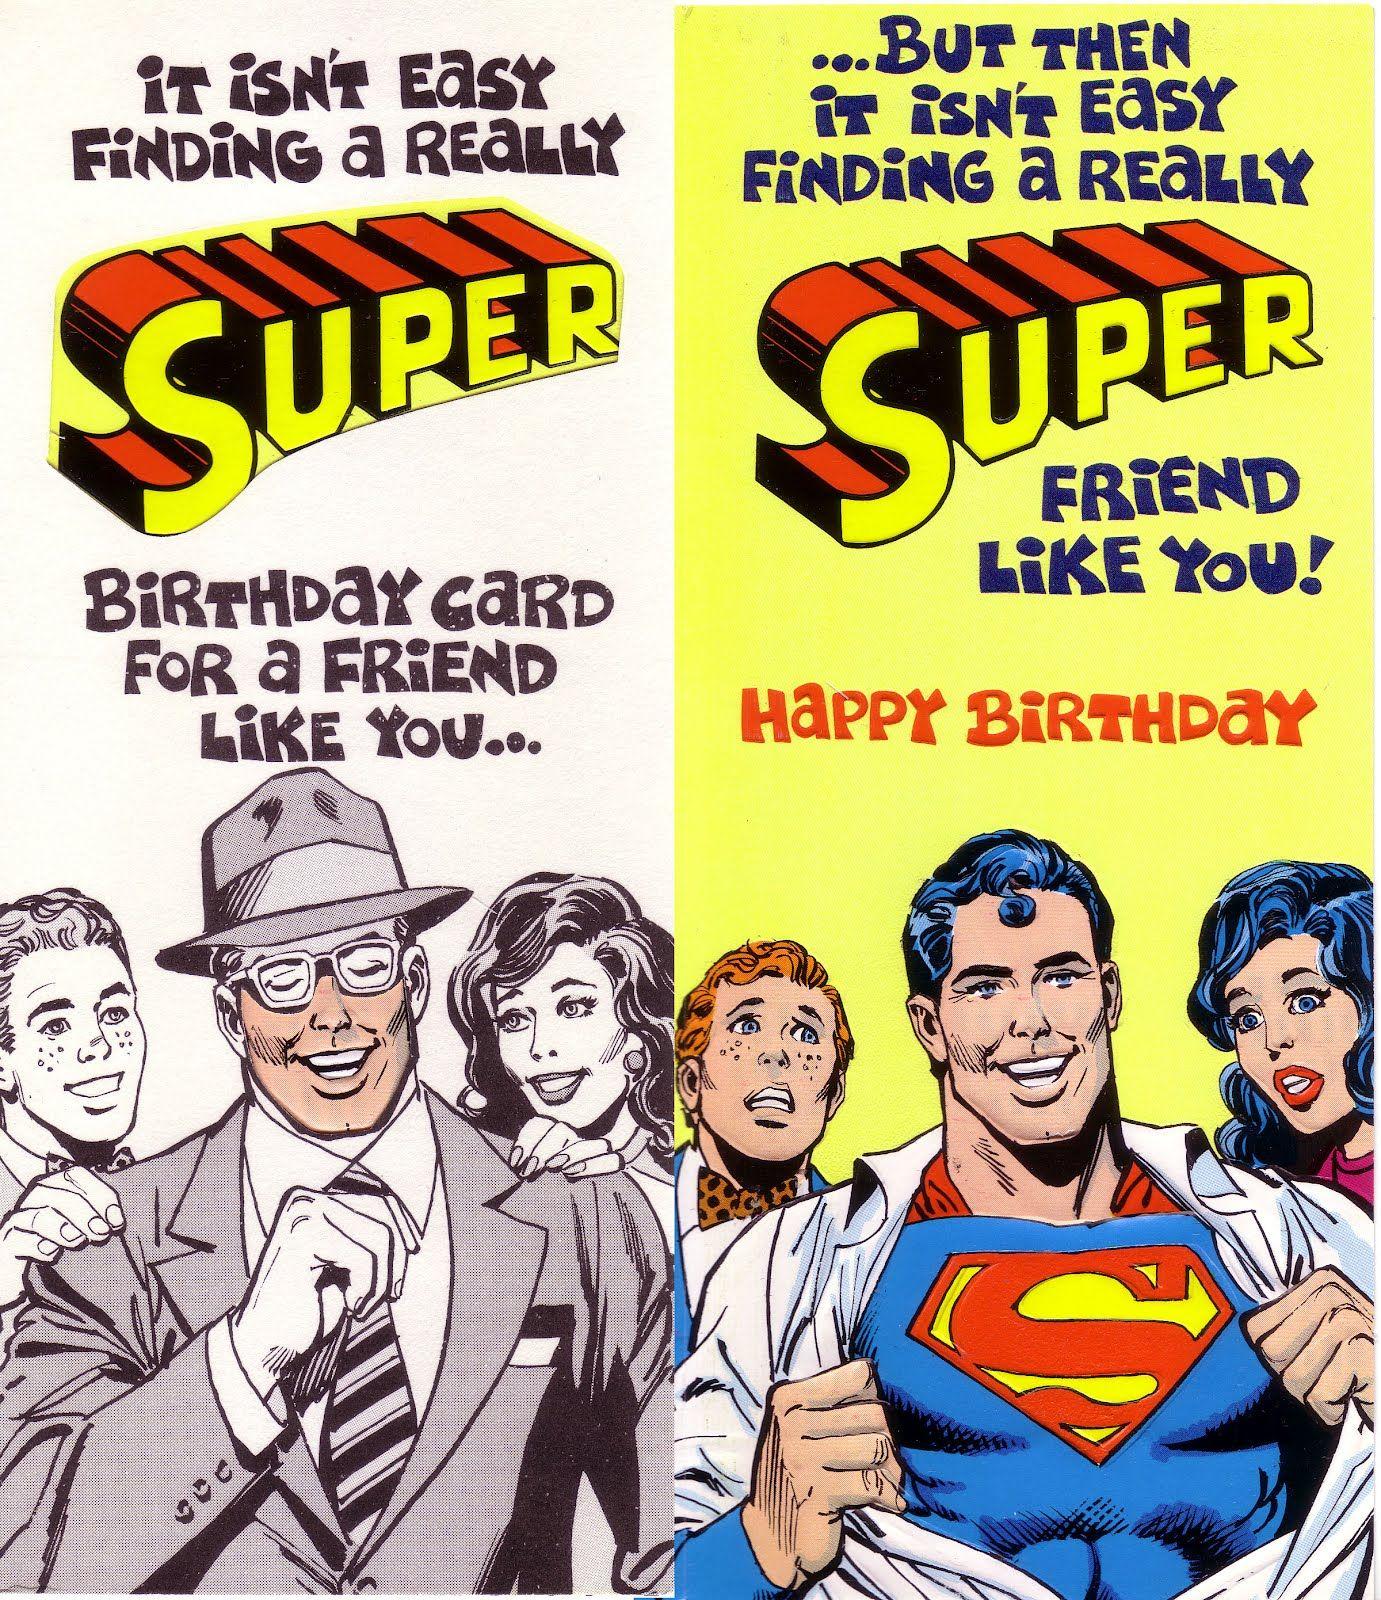 Birthday5 (1381 1600)